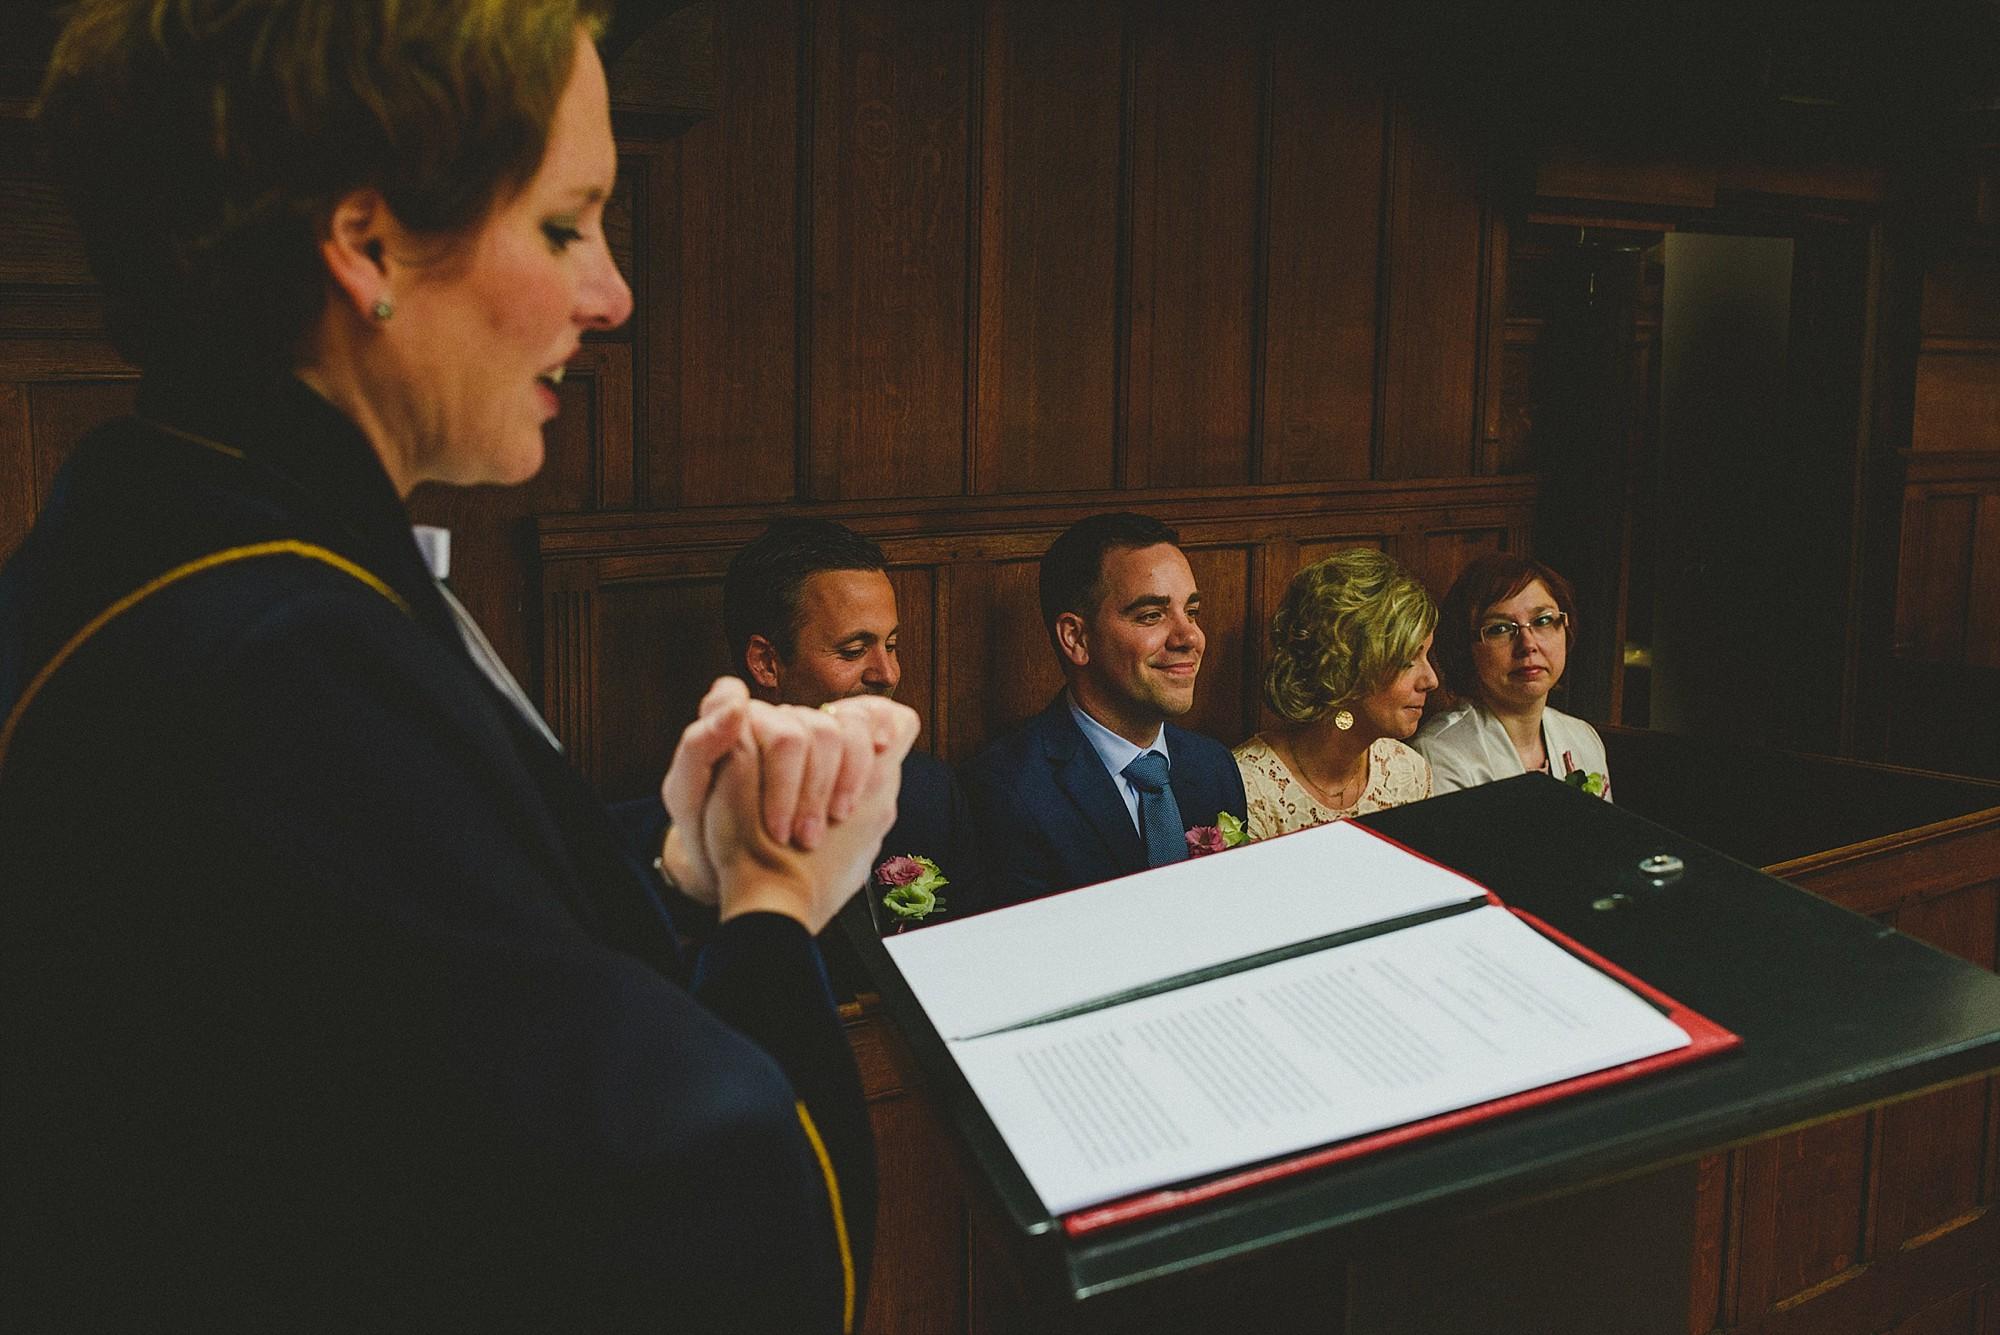 beste trouwfotograaf van nederland (40 van 69).jpg